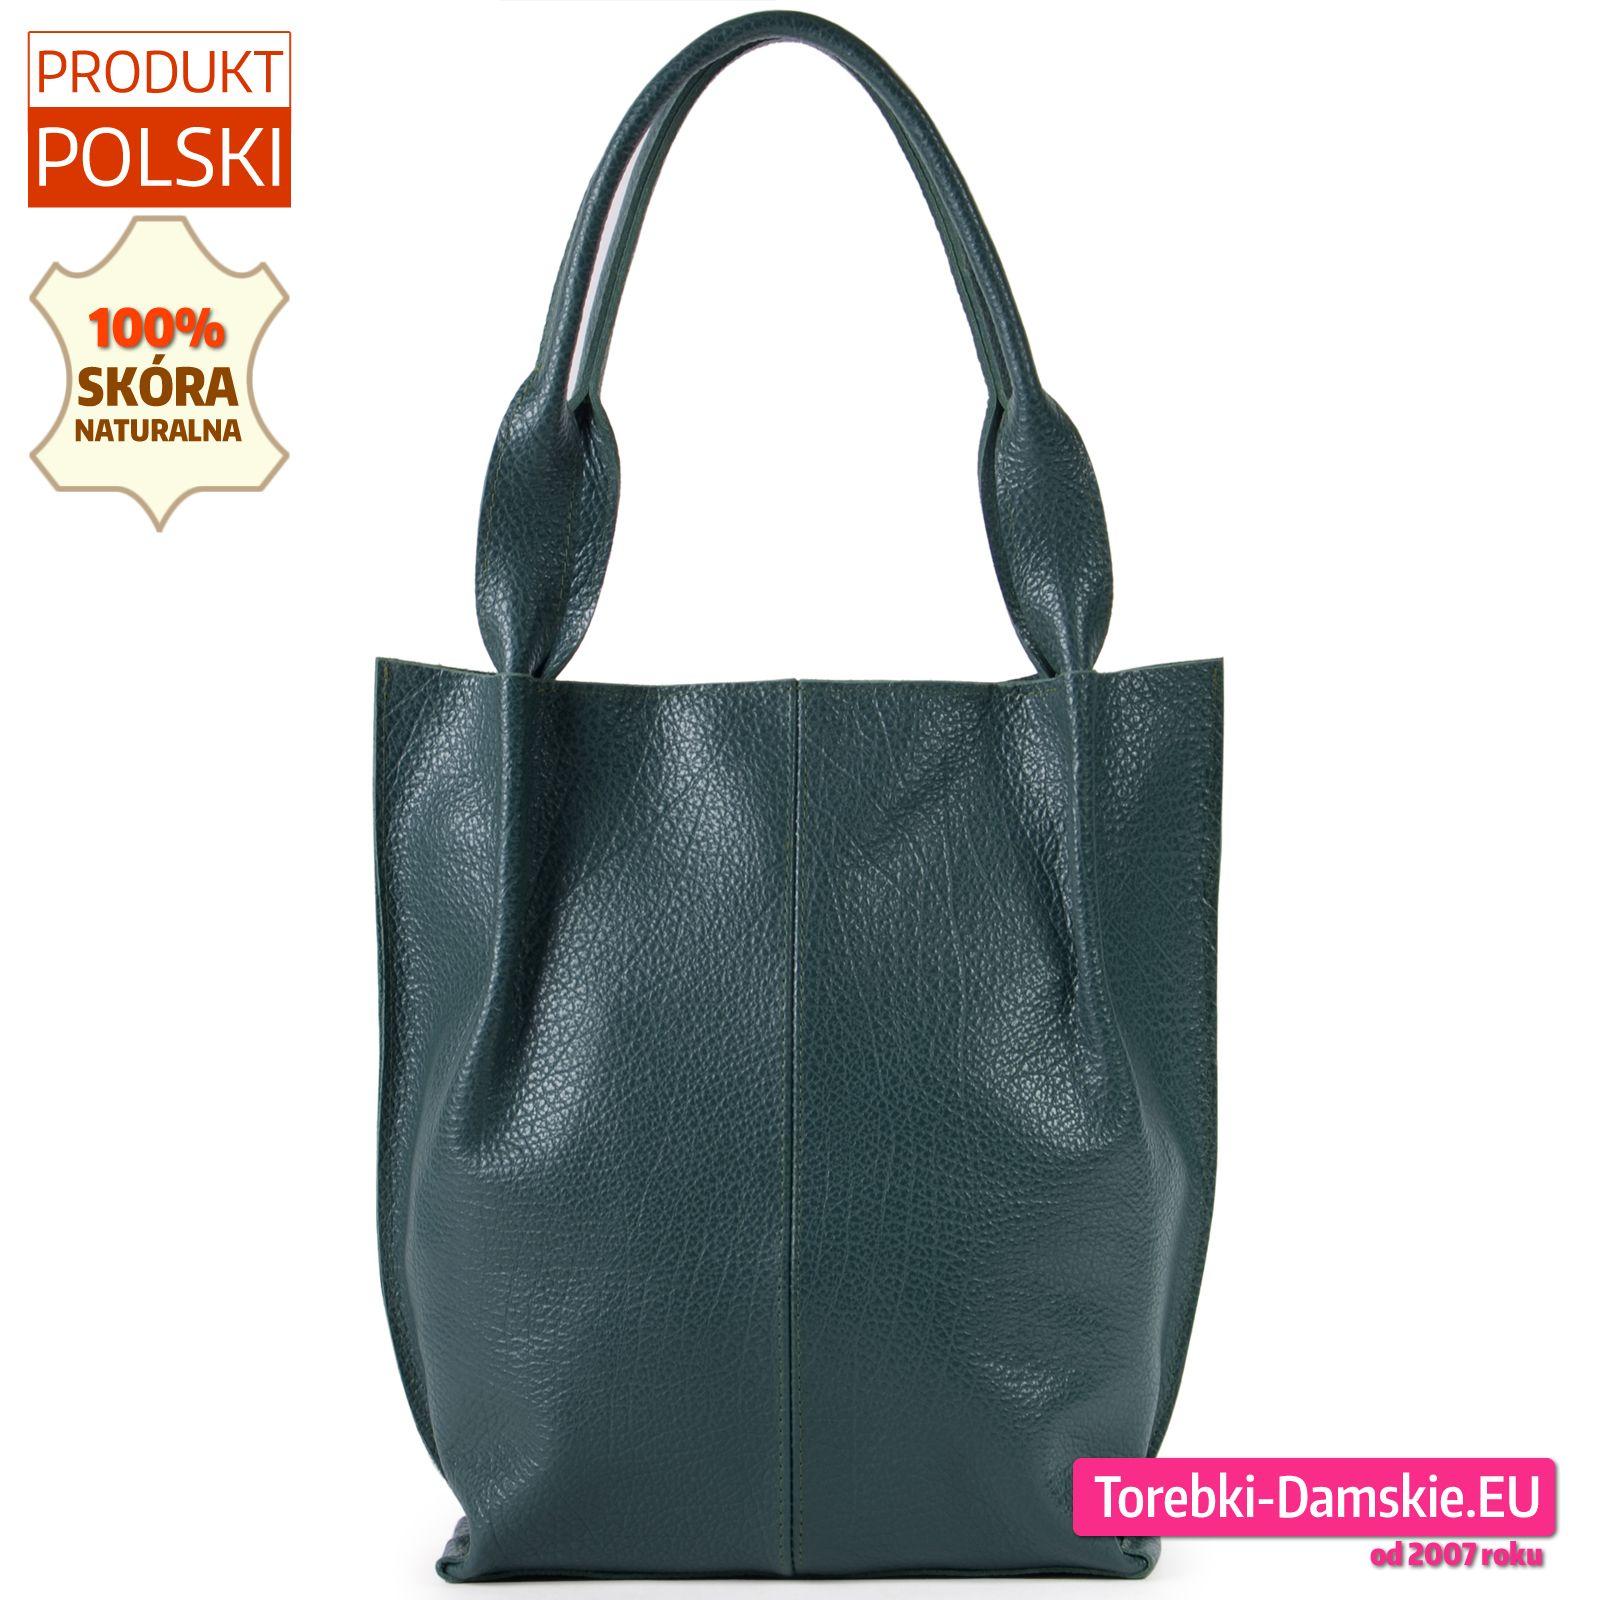 Zielona Torba Damska Ze Skory Naturalnej Duzy Shopperbag Tote Bag Tote Bags